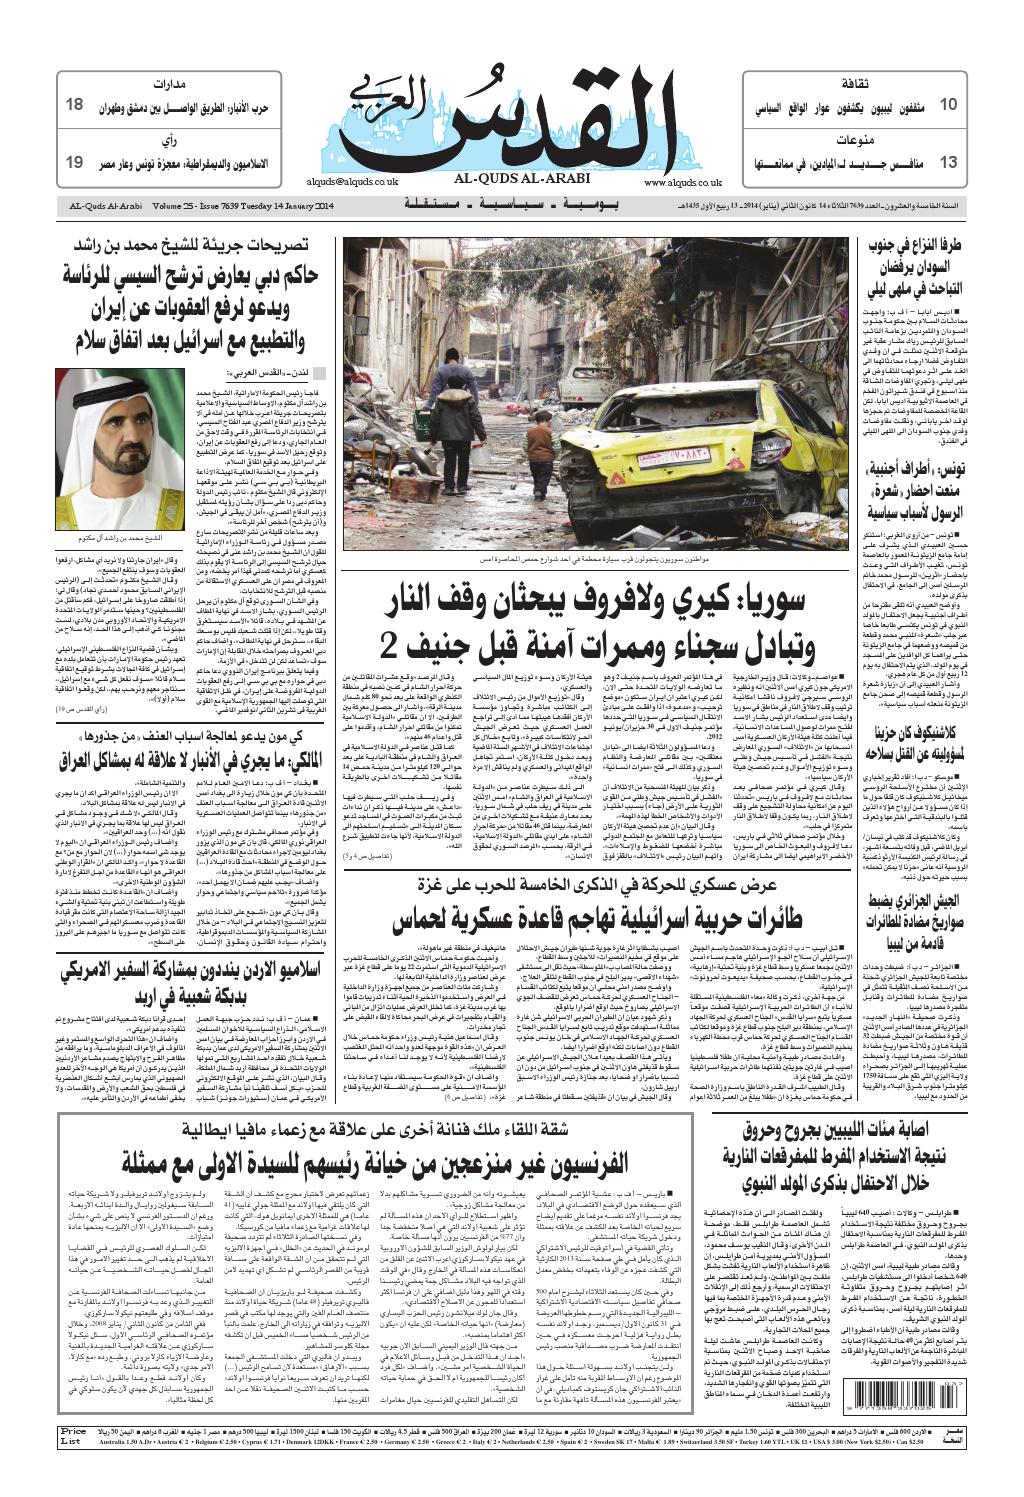 7ca4b97b4 صحيفة القدس العربي , الثلاثاء 14.01.2014 by مركز الحدث - issuu